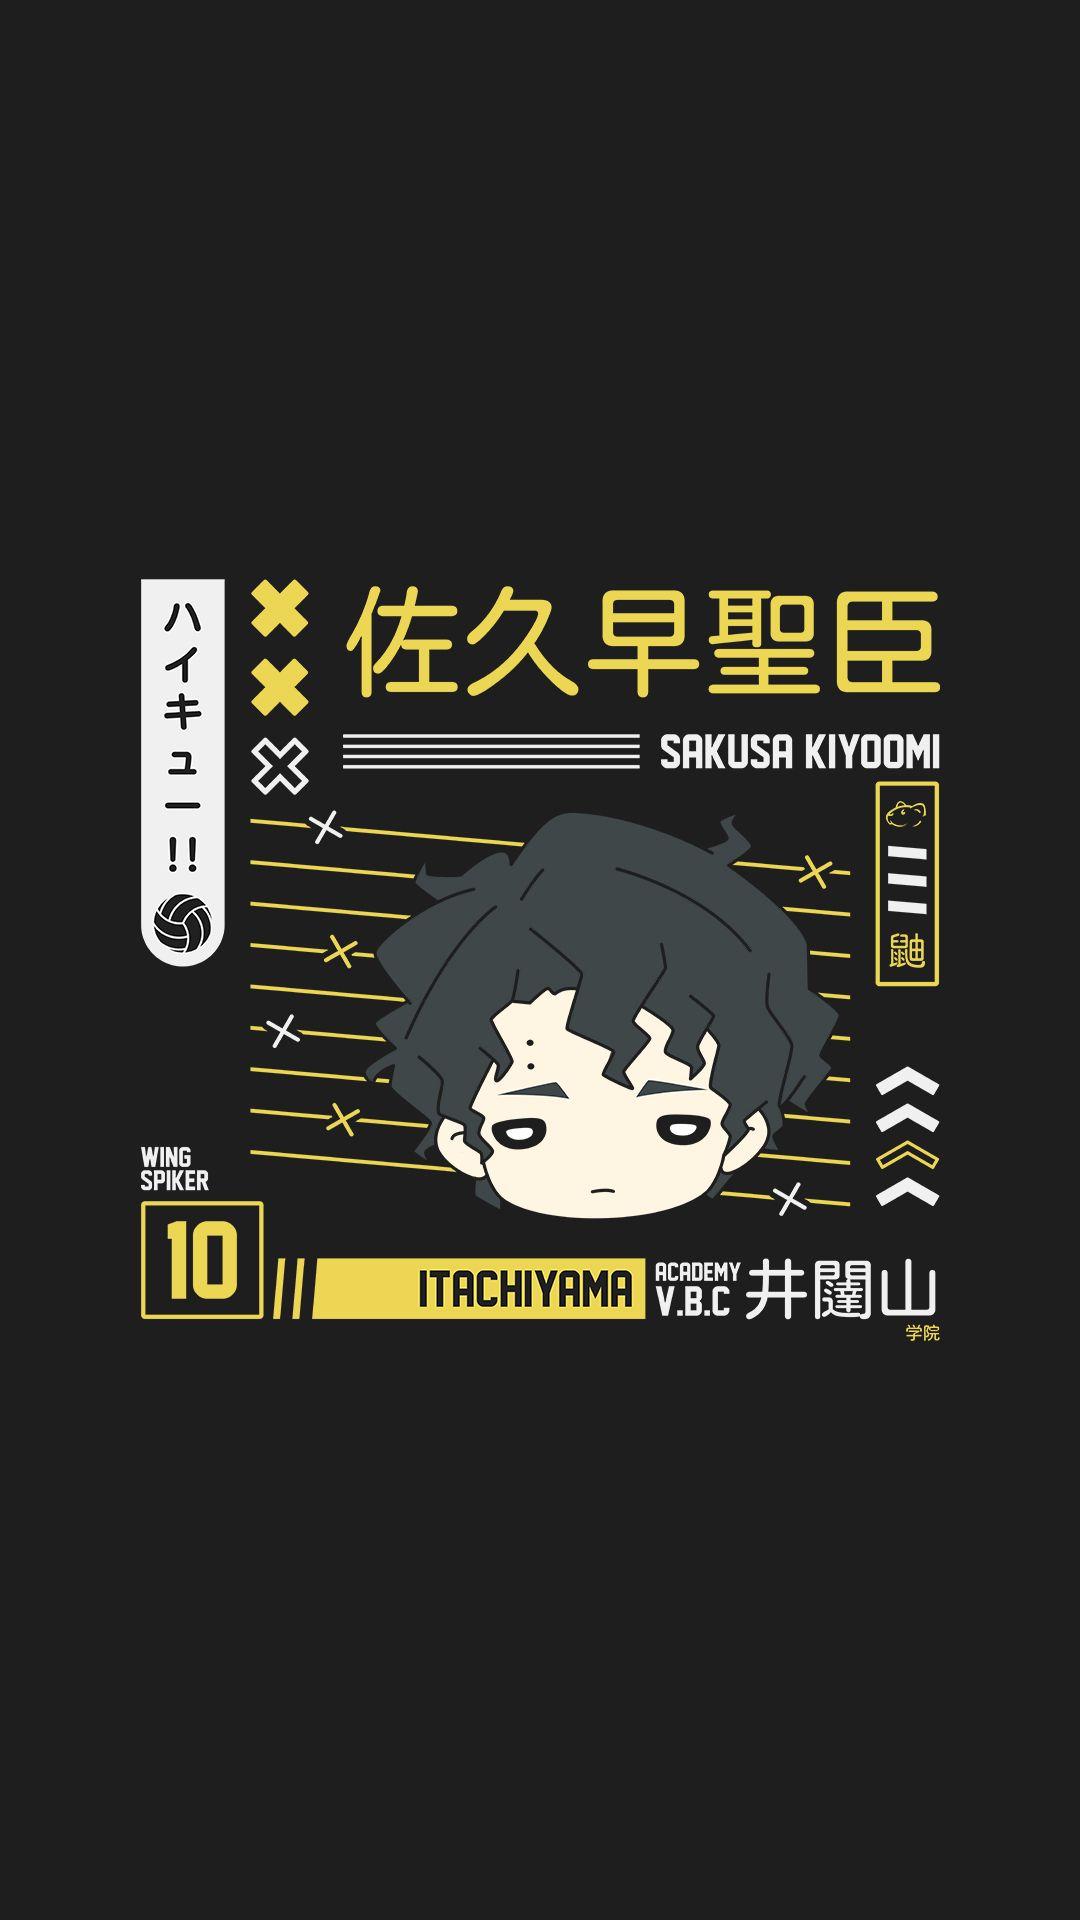 Sakusa Kiyoomi Wallpaper - Itachiyama - Click to Shop Haikyuu Merch With this Design